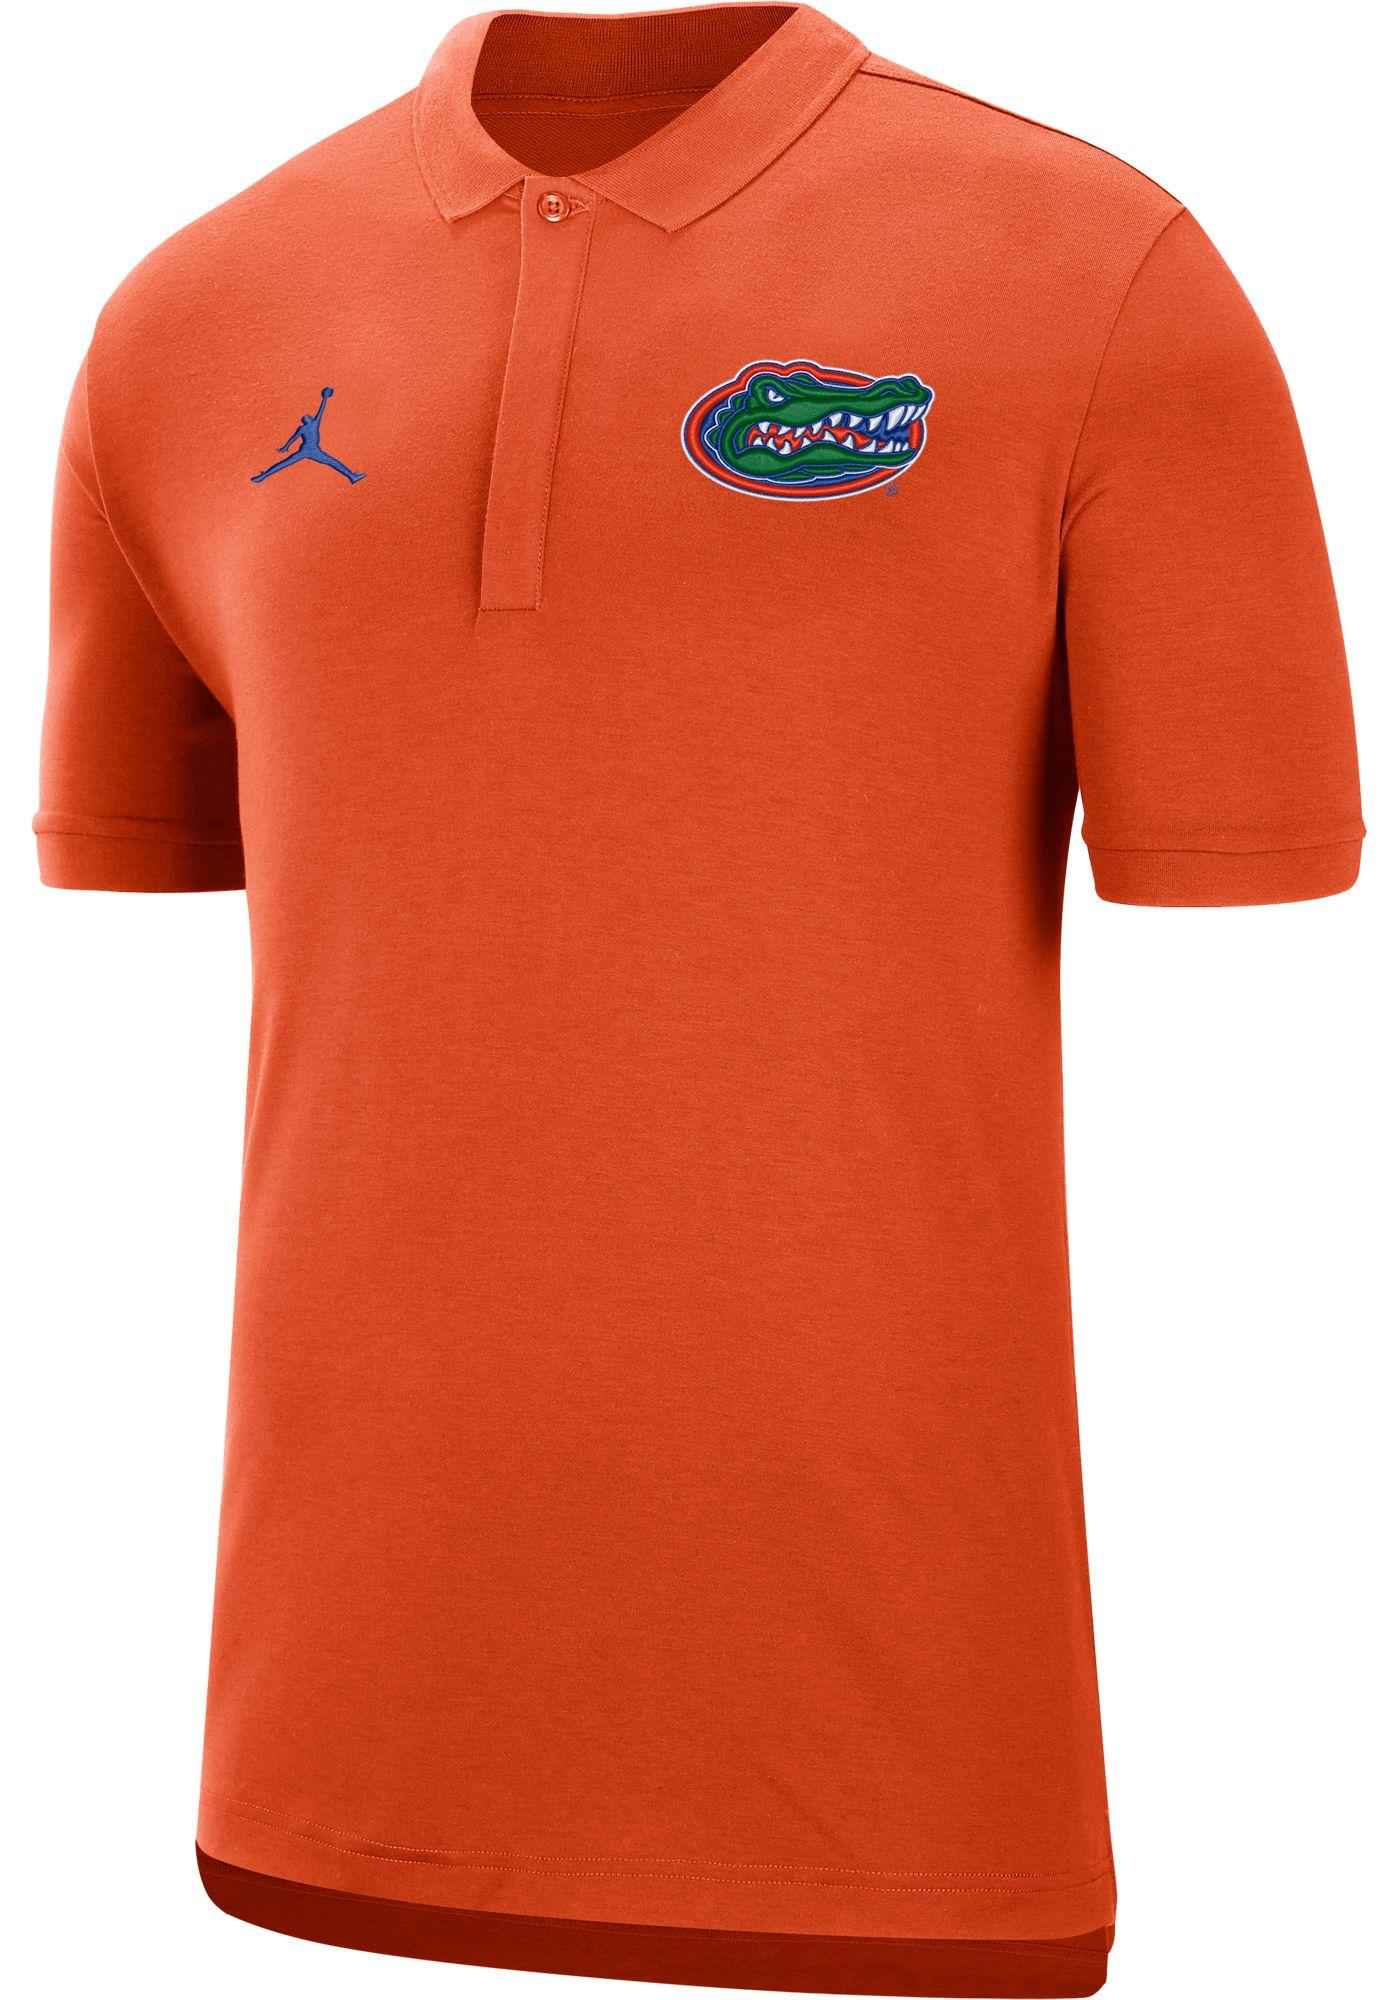 Jordan Men's Florida Gators Orange Dri-FIT Elite Football Sideline Polo